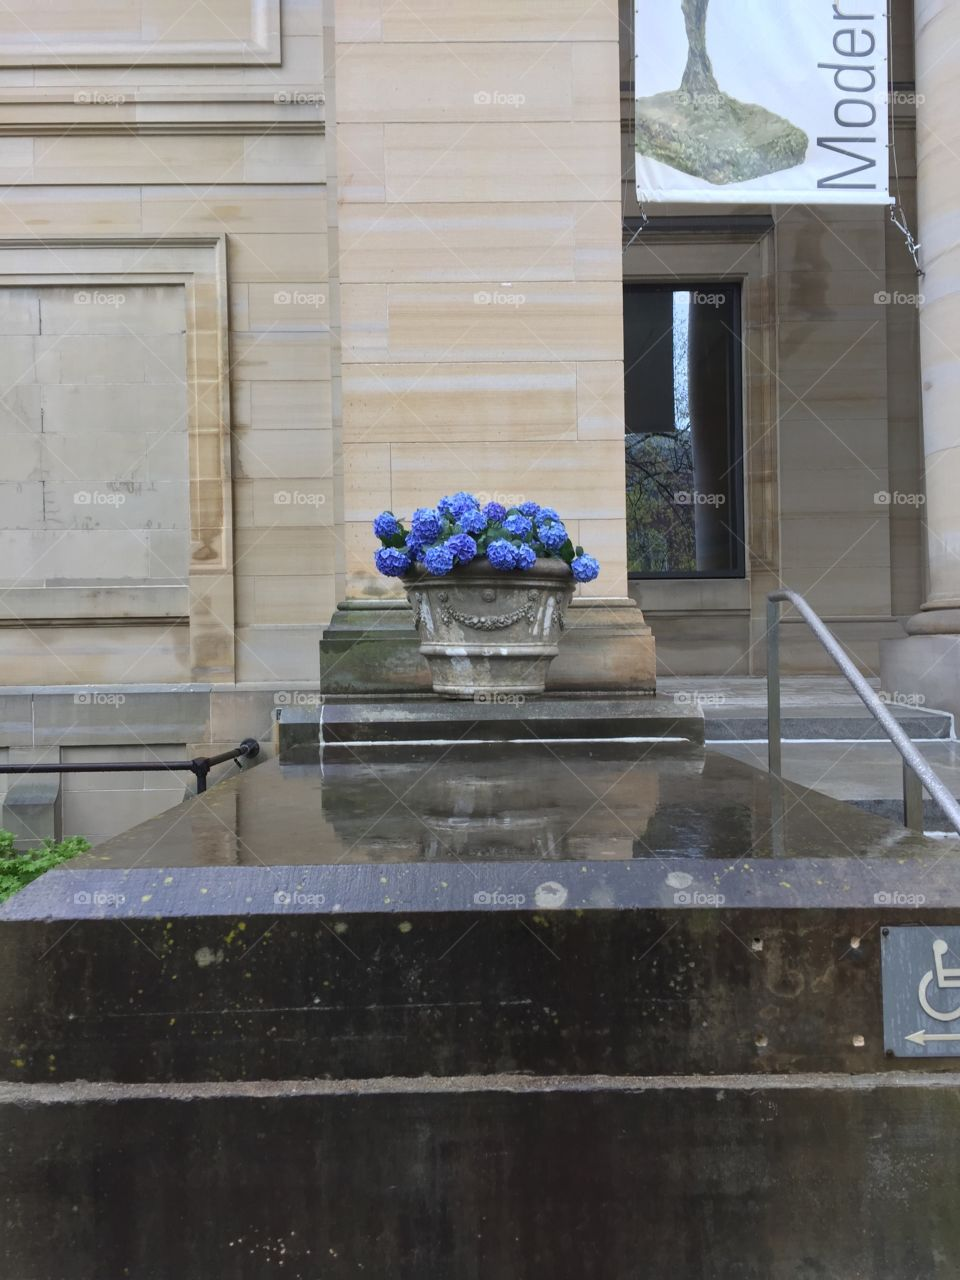 Flowers outside of UMMA in the Rain